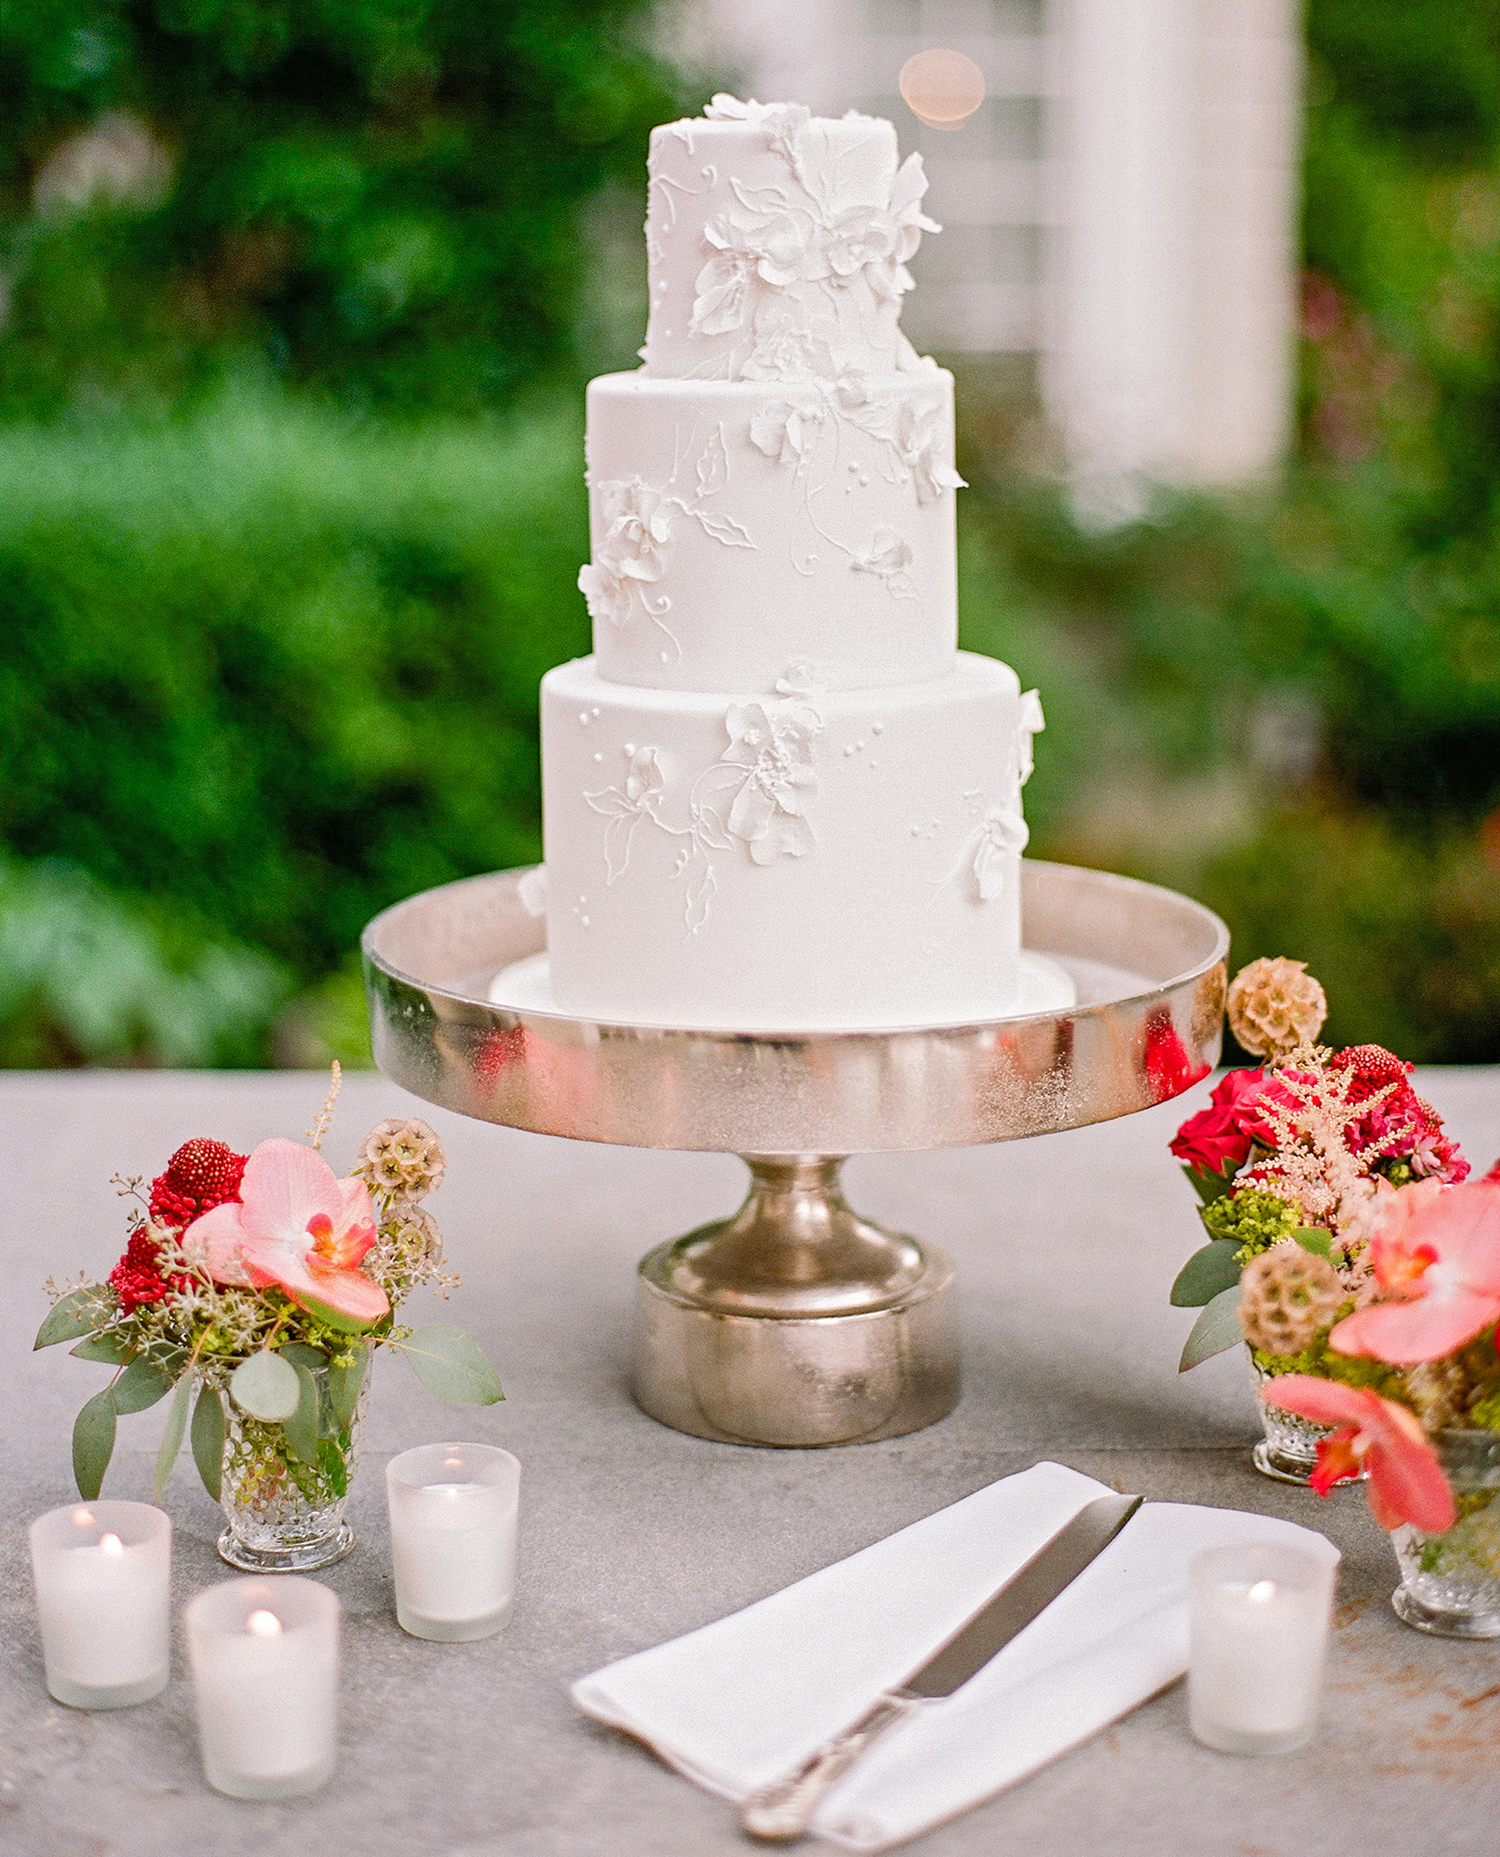 melissa michael wedding cake on stand